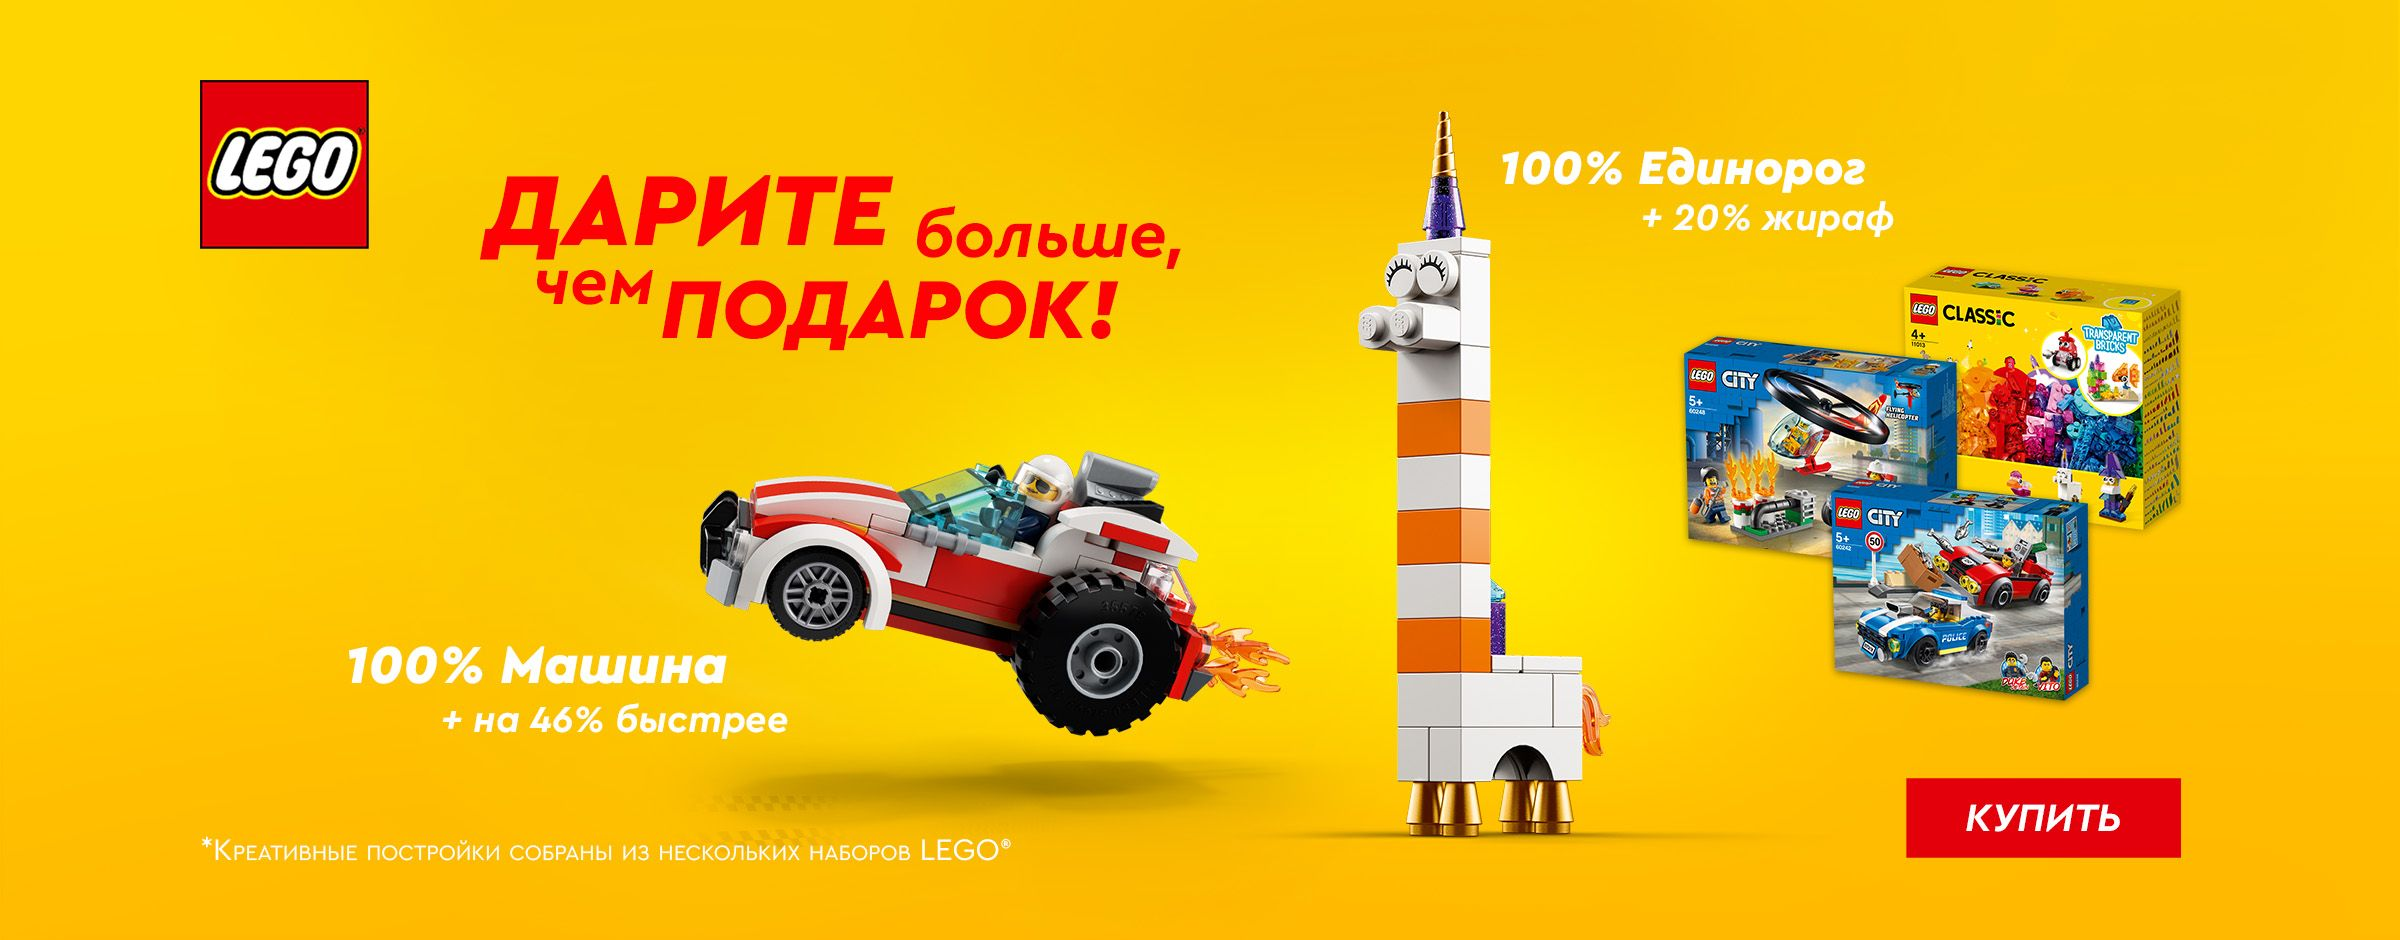 Дарите больше, чем подарок (Lego Shopper play) SIS